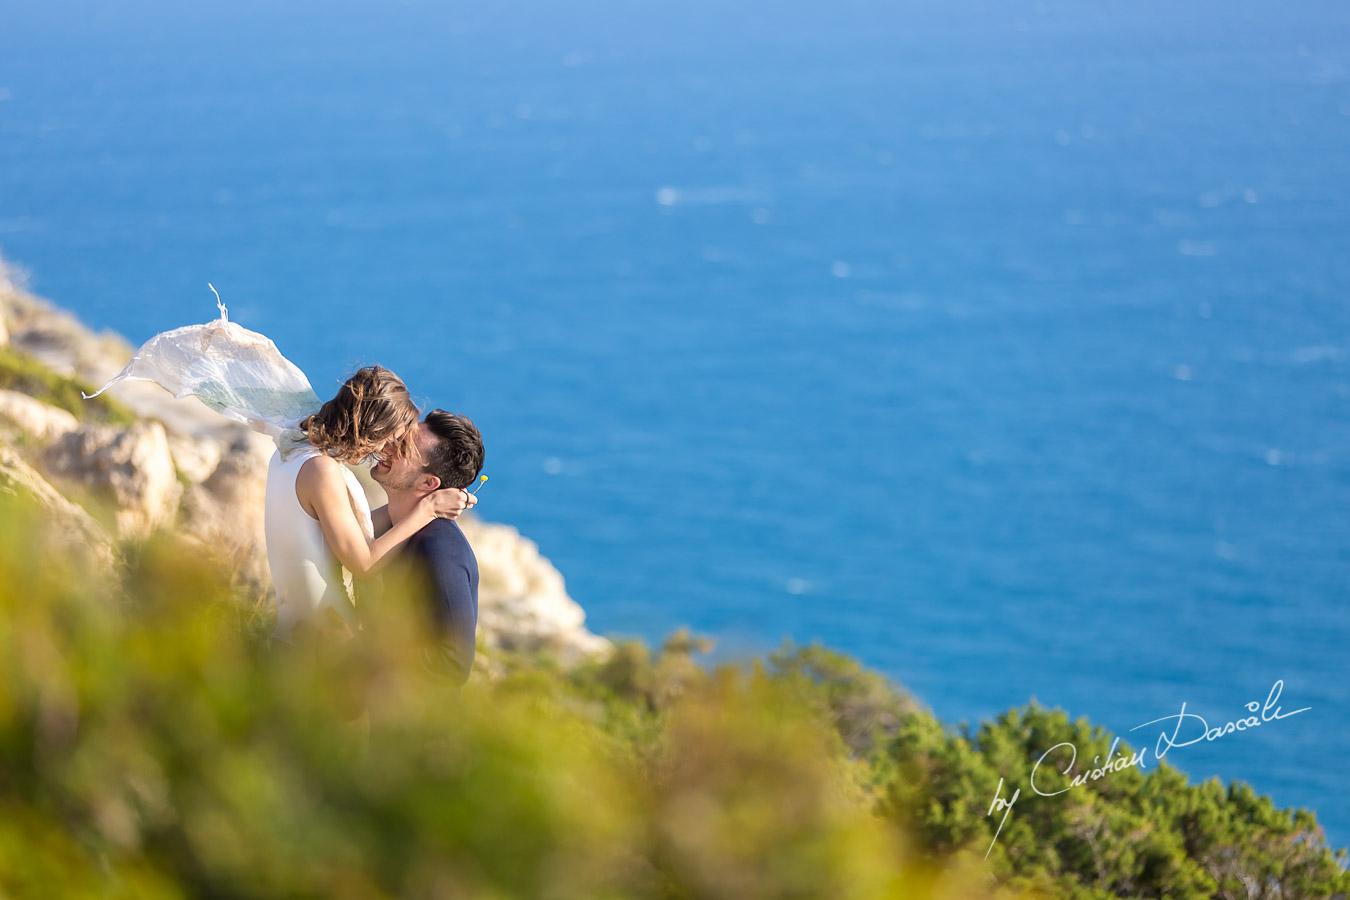 Love at first sight - Karen & Martins at Kurion Cyprus - 08